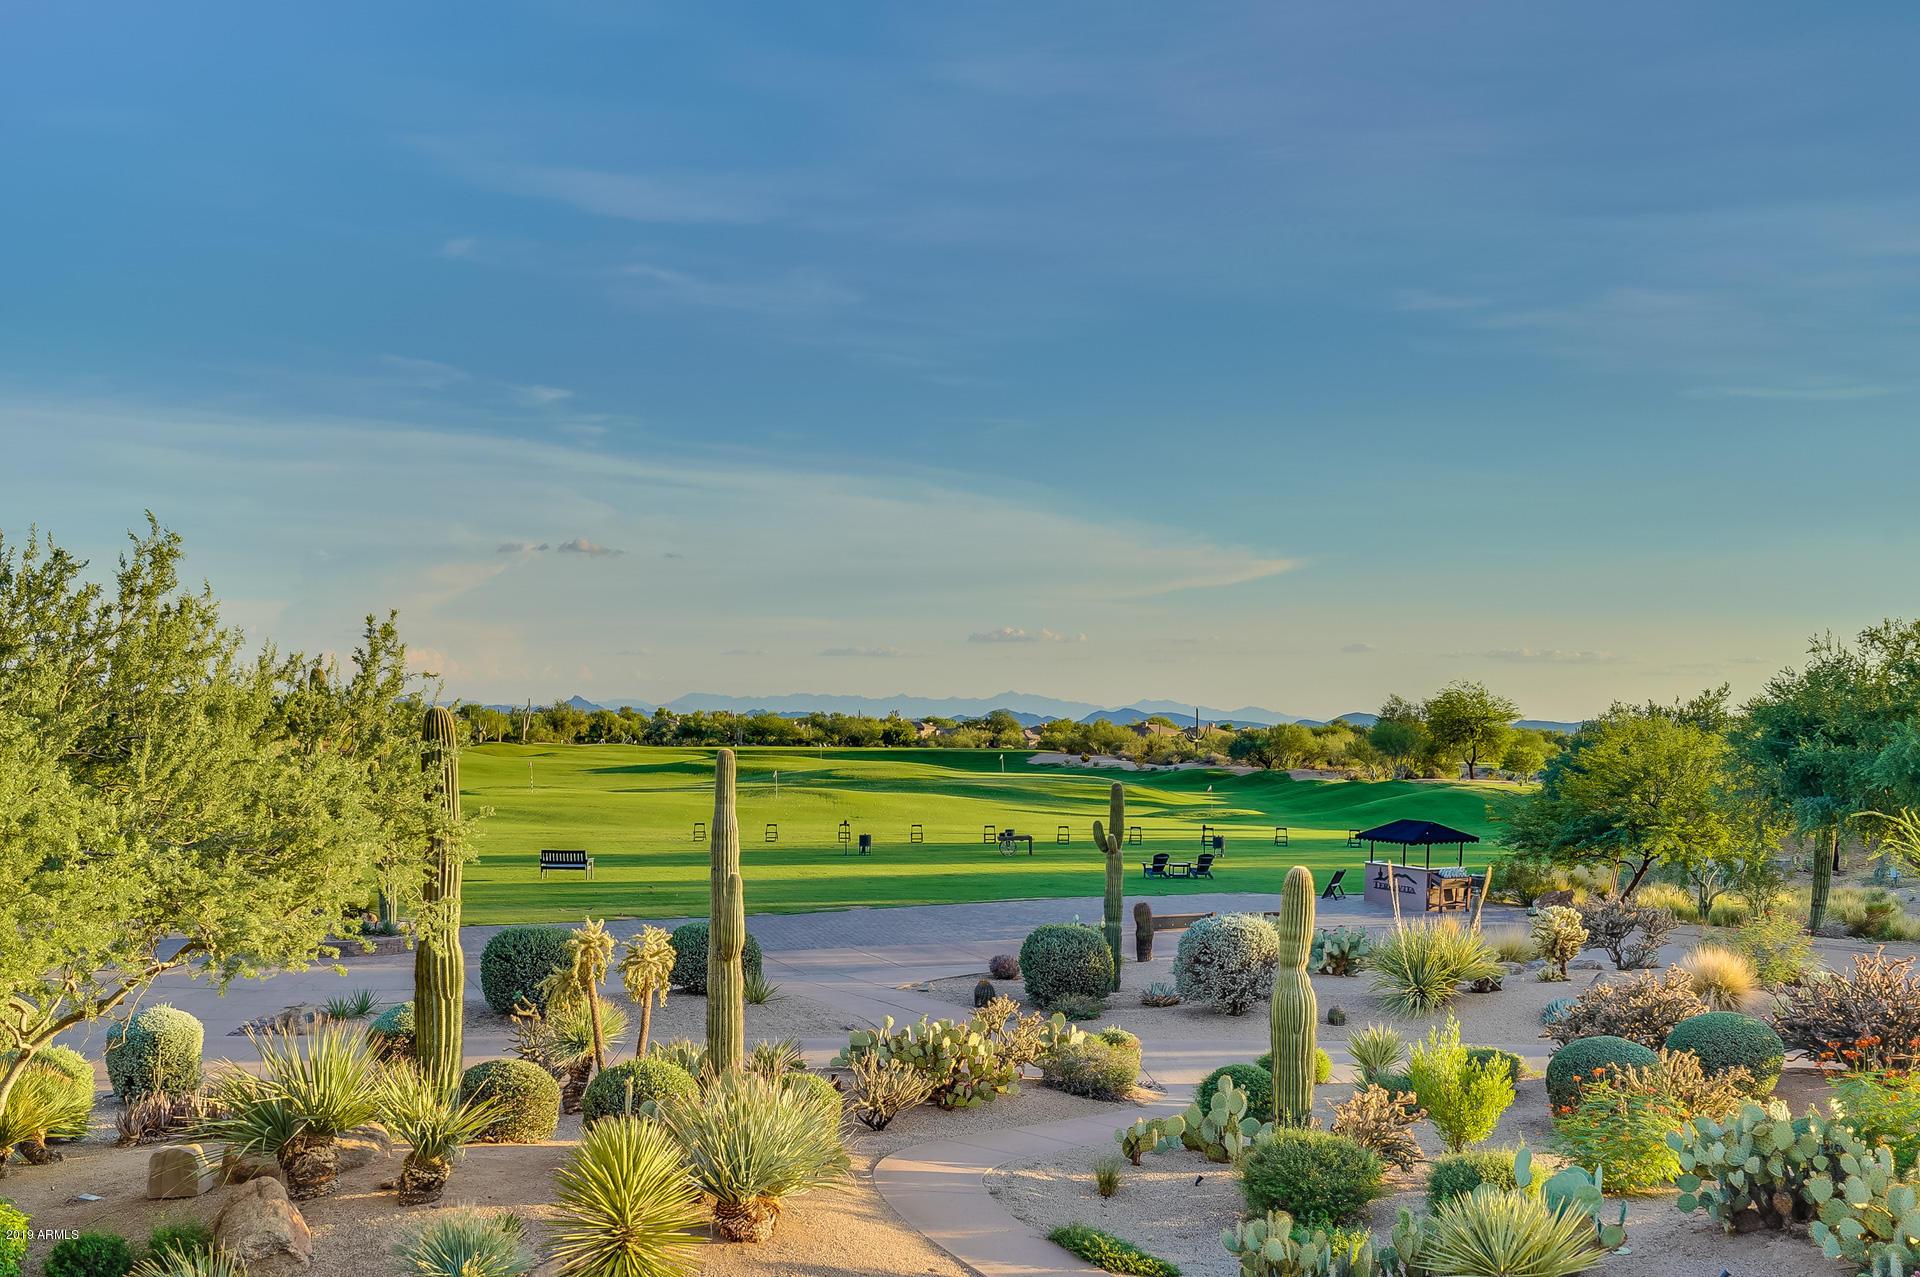 MLS 5865737 7059 E SHOOTING STAR Way, Scottsdale, AZ 85266 Scottsdale AZ Terravita